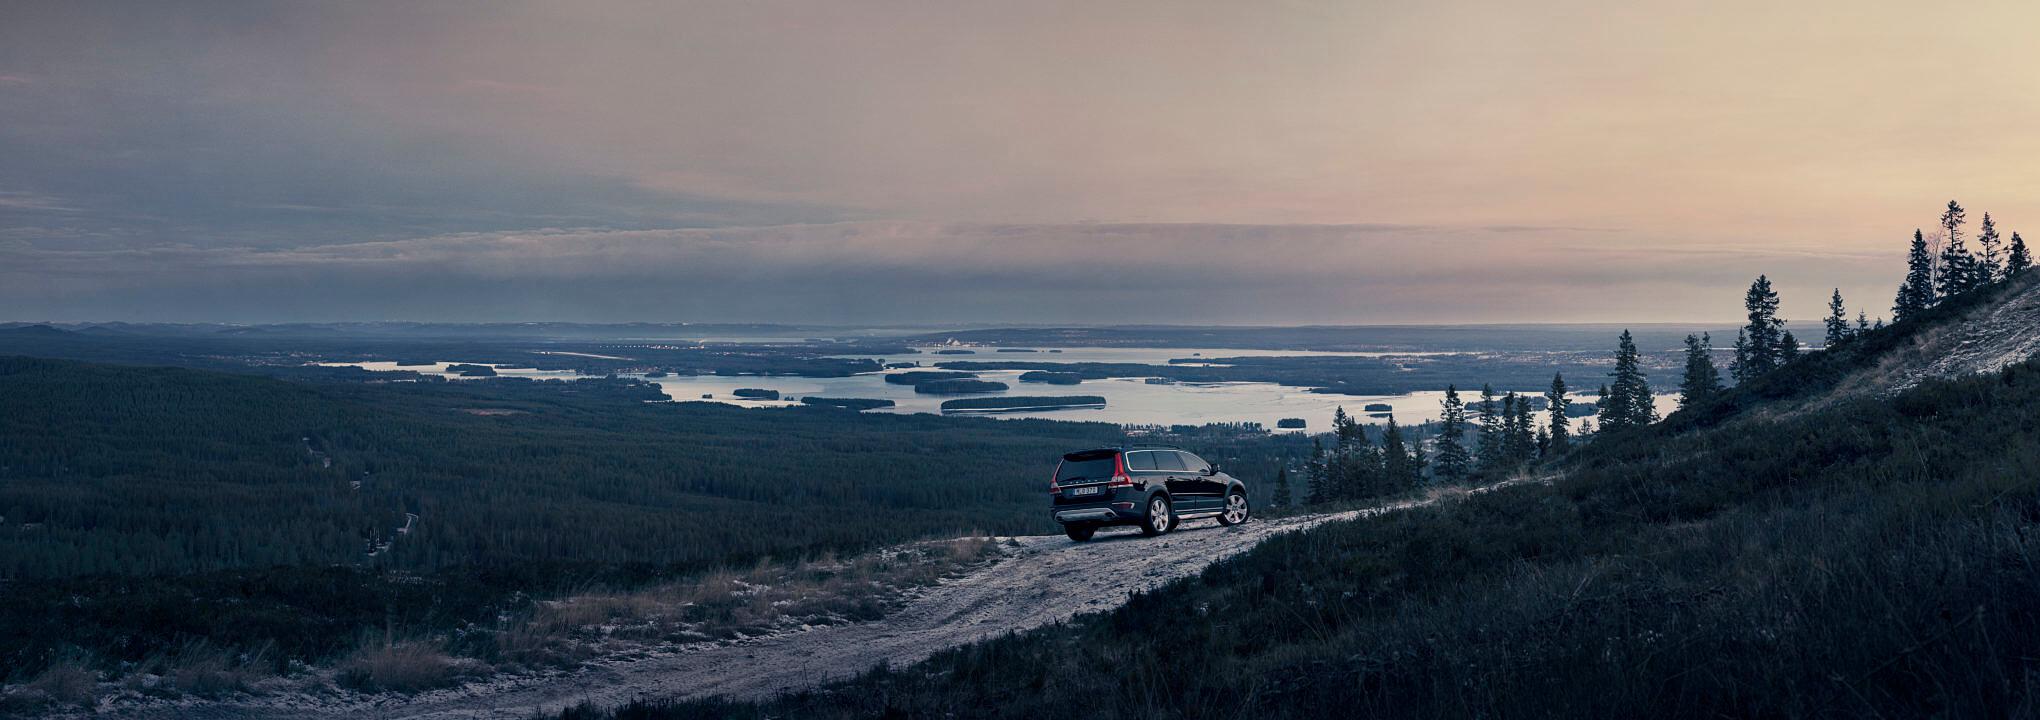 Volvo Made By Sweden Dalarna